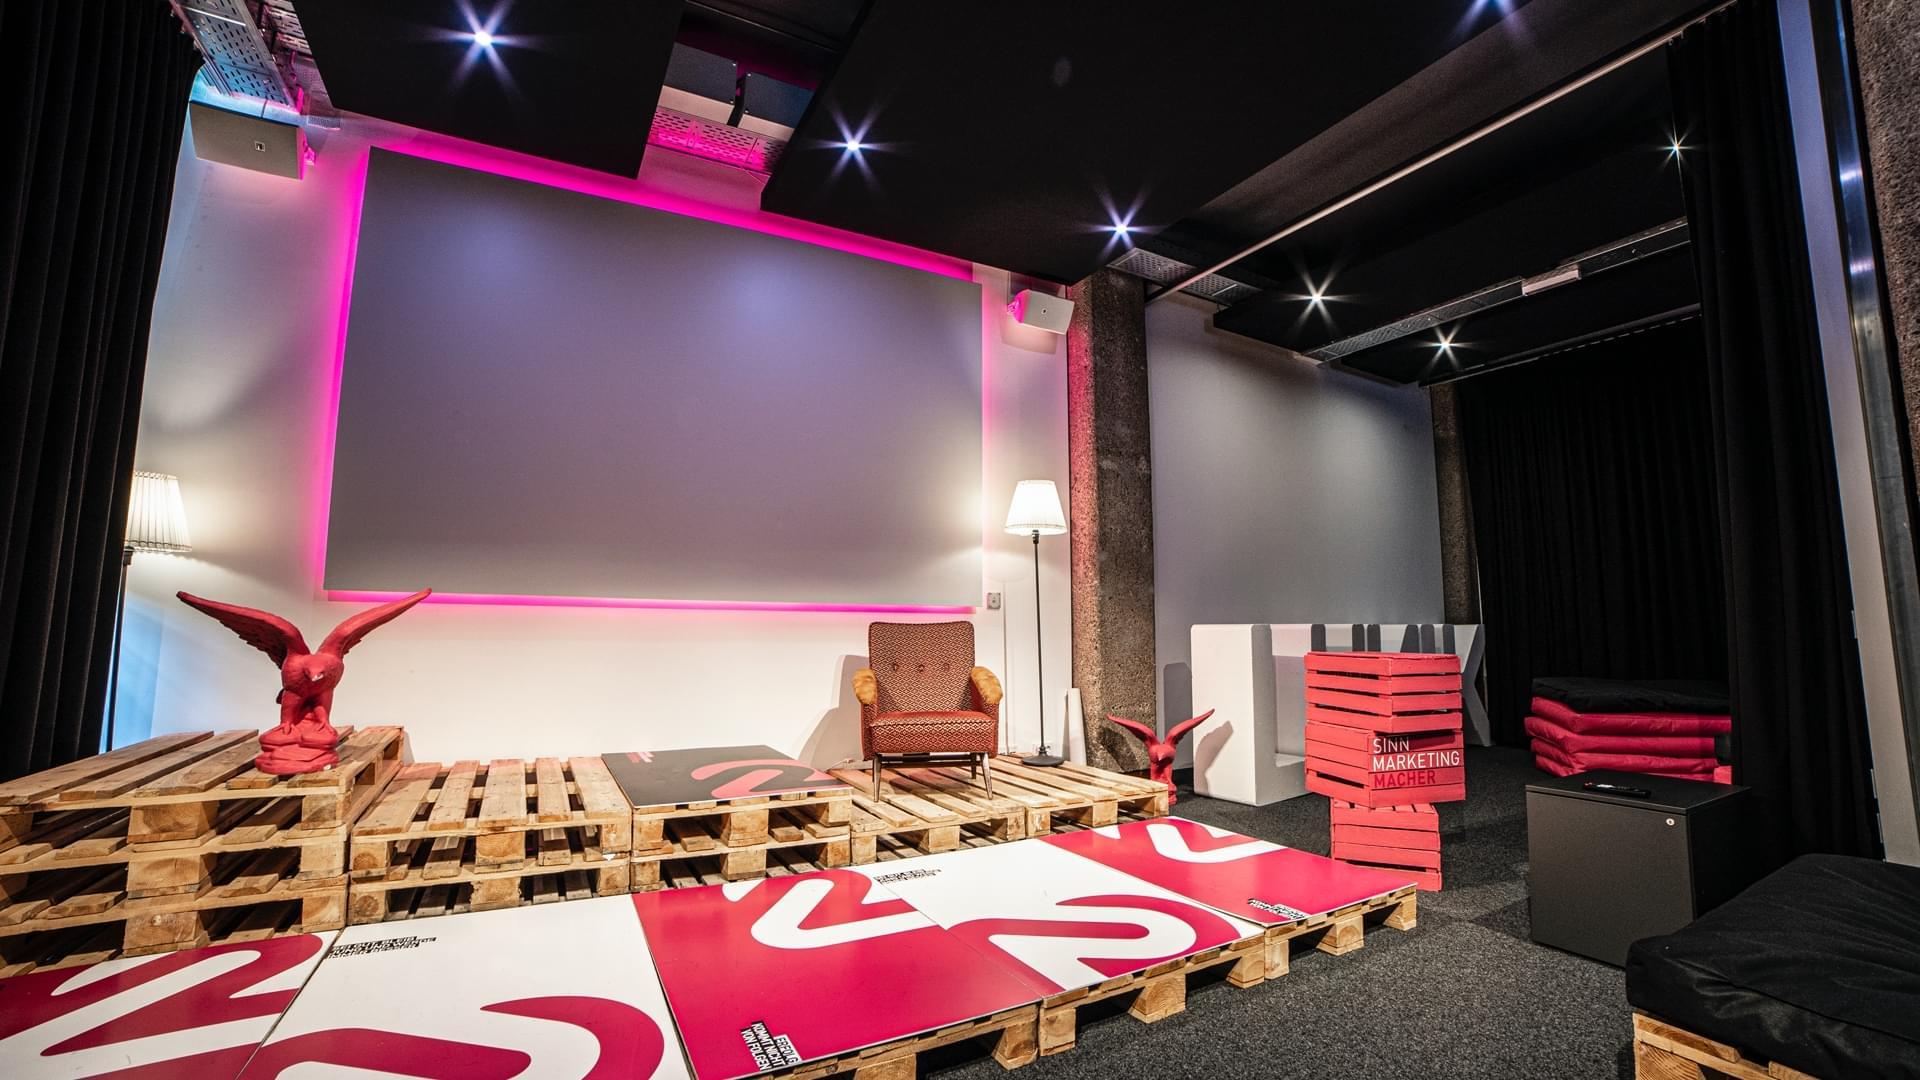 Lunik 2 – Multimedia Room mit Loxone ausgestattet